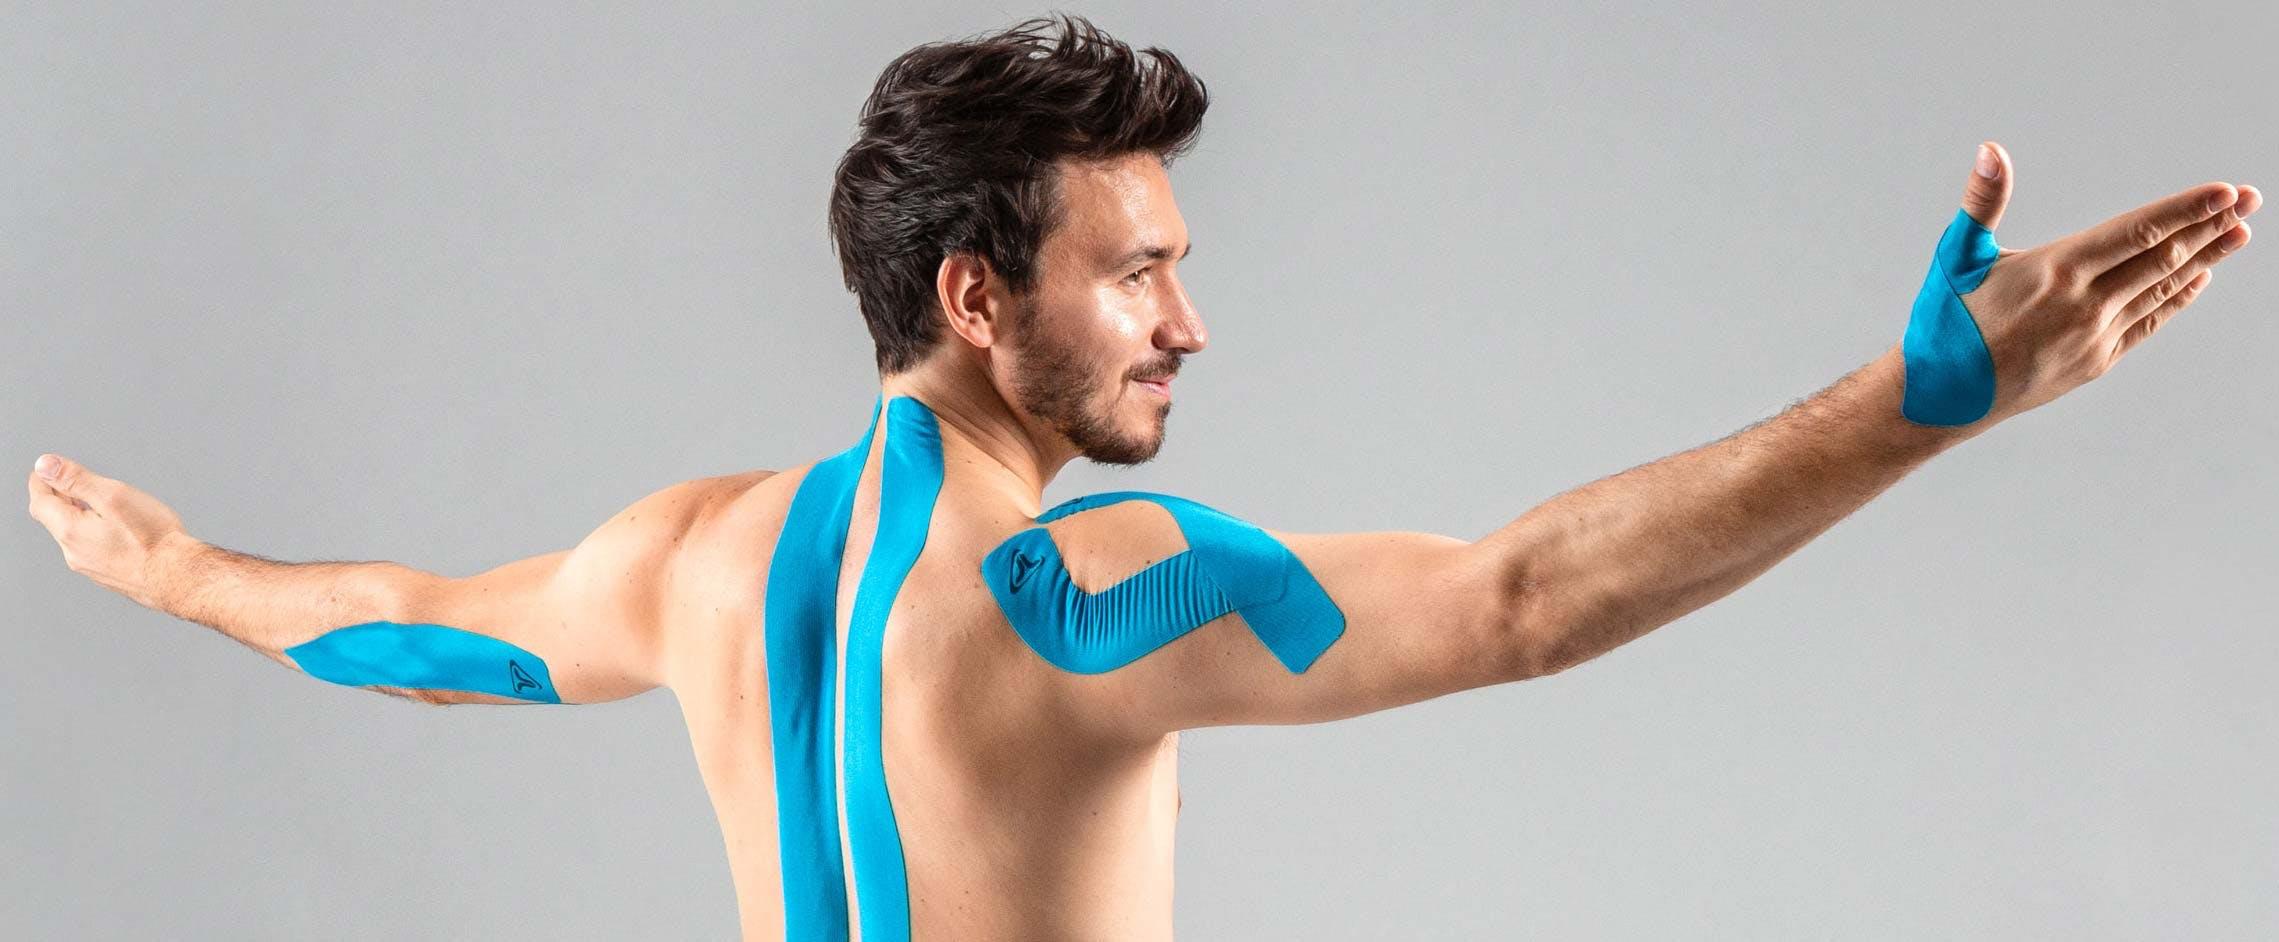 Felix Neureuther posiert mit Truetape Kinesiotape an seinem Körper